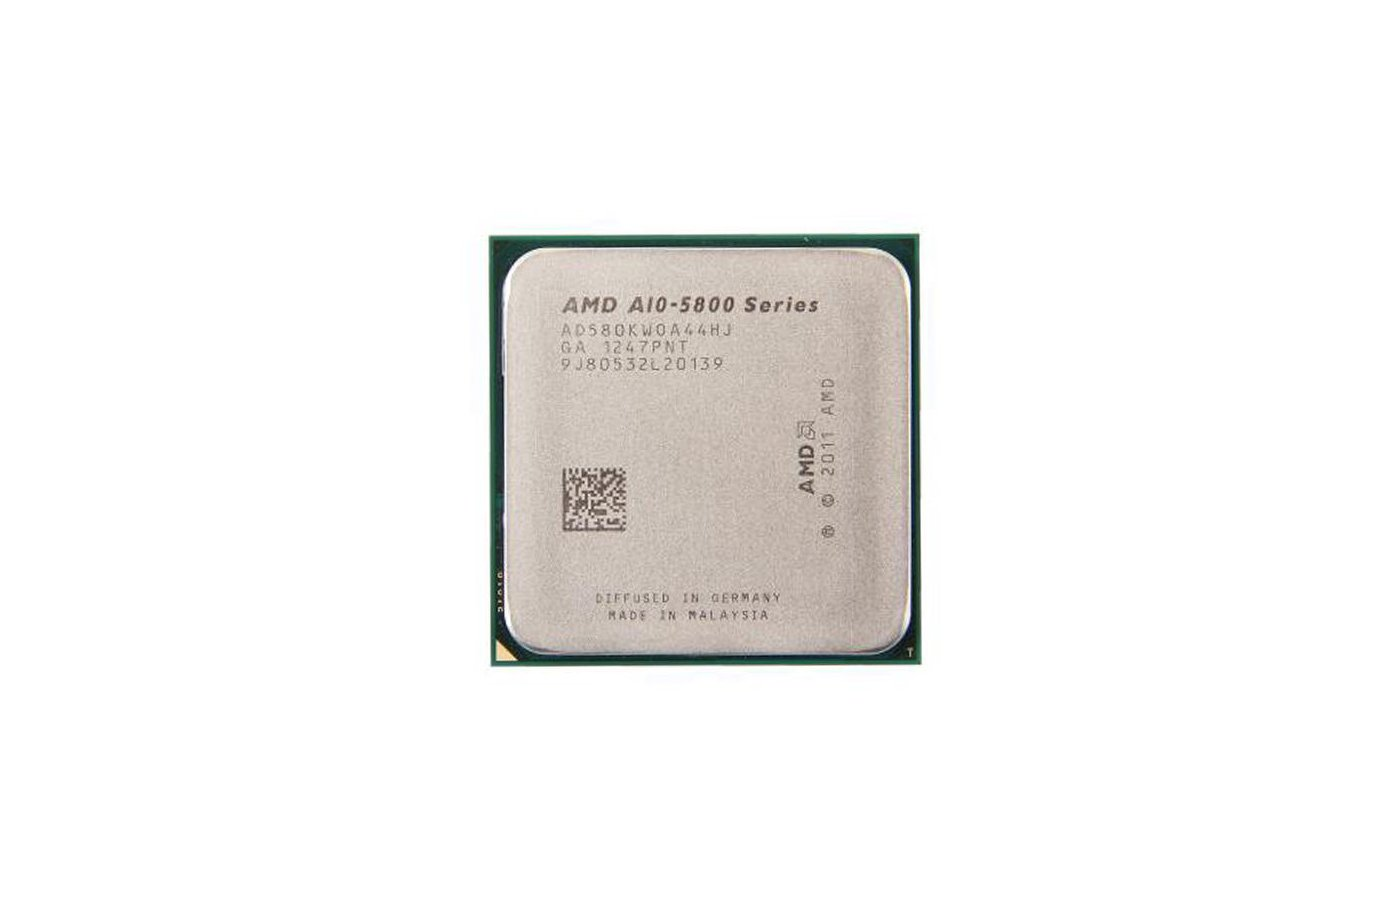 Процессор AMD A10 5800K FM2 (AD580KWOA44HJ) (3.8GHz/5000MHz/AMD Radeon HD 7660D) OEM